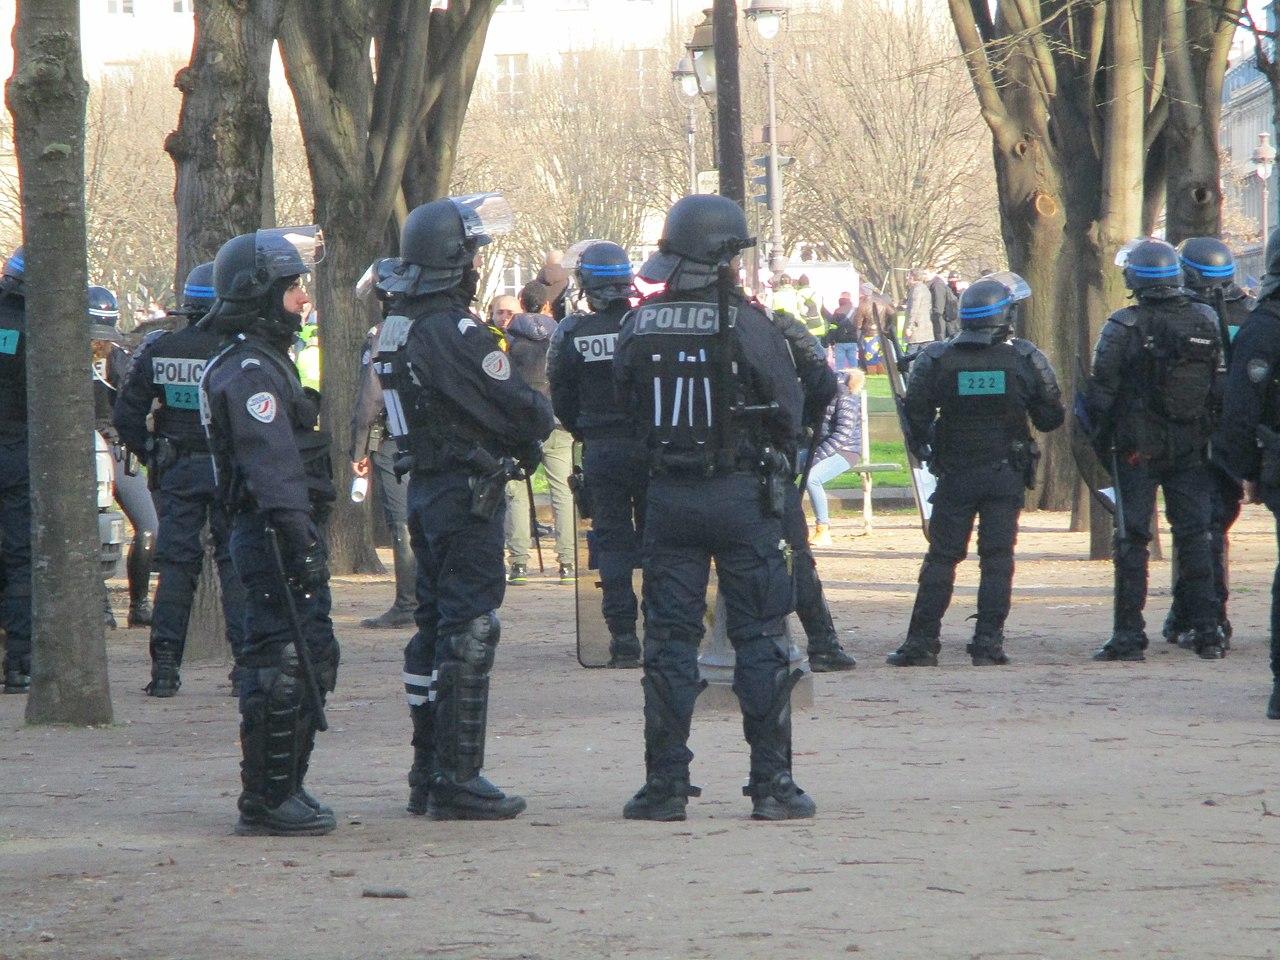 Paris manif 16 février 2019 1.jpg